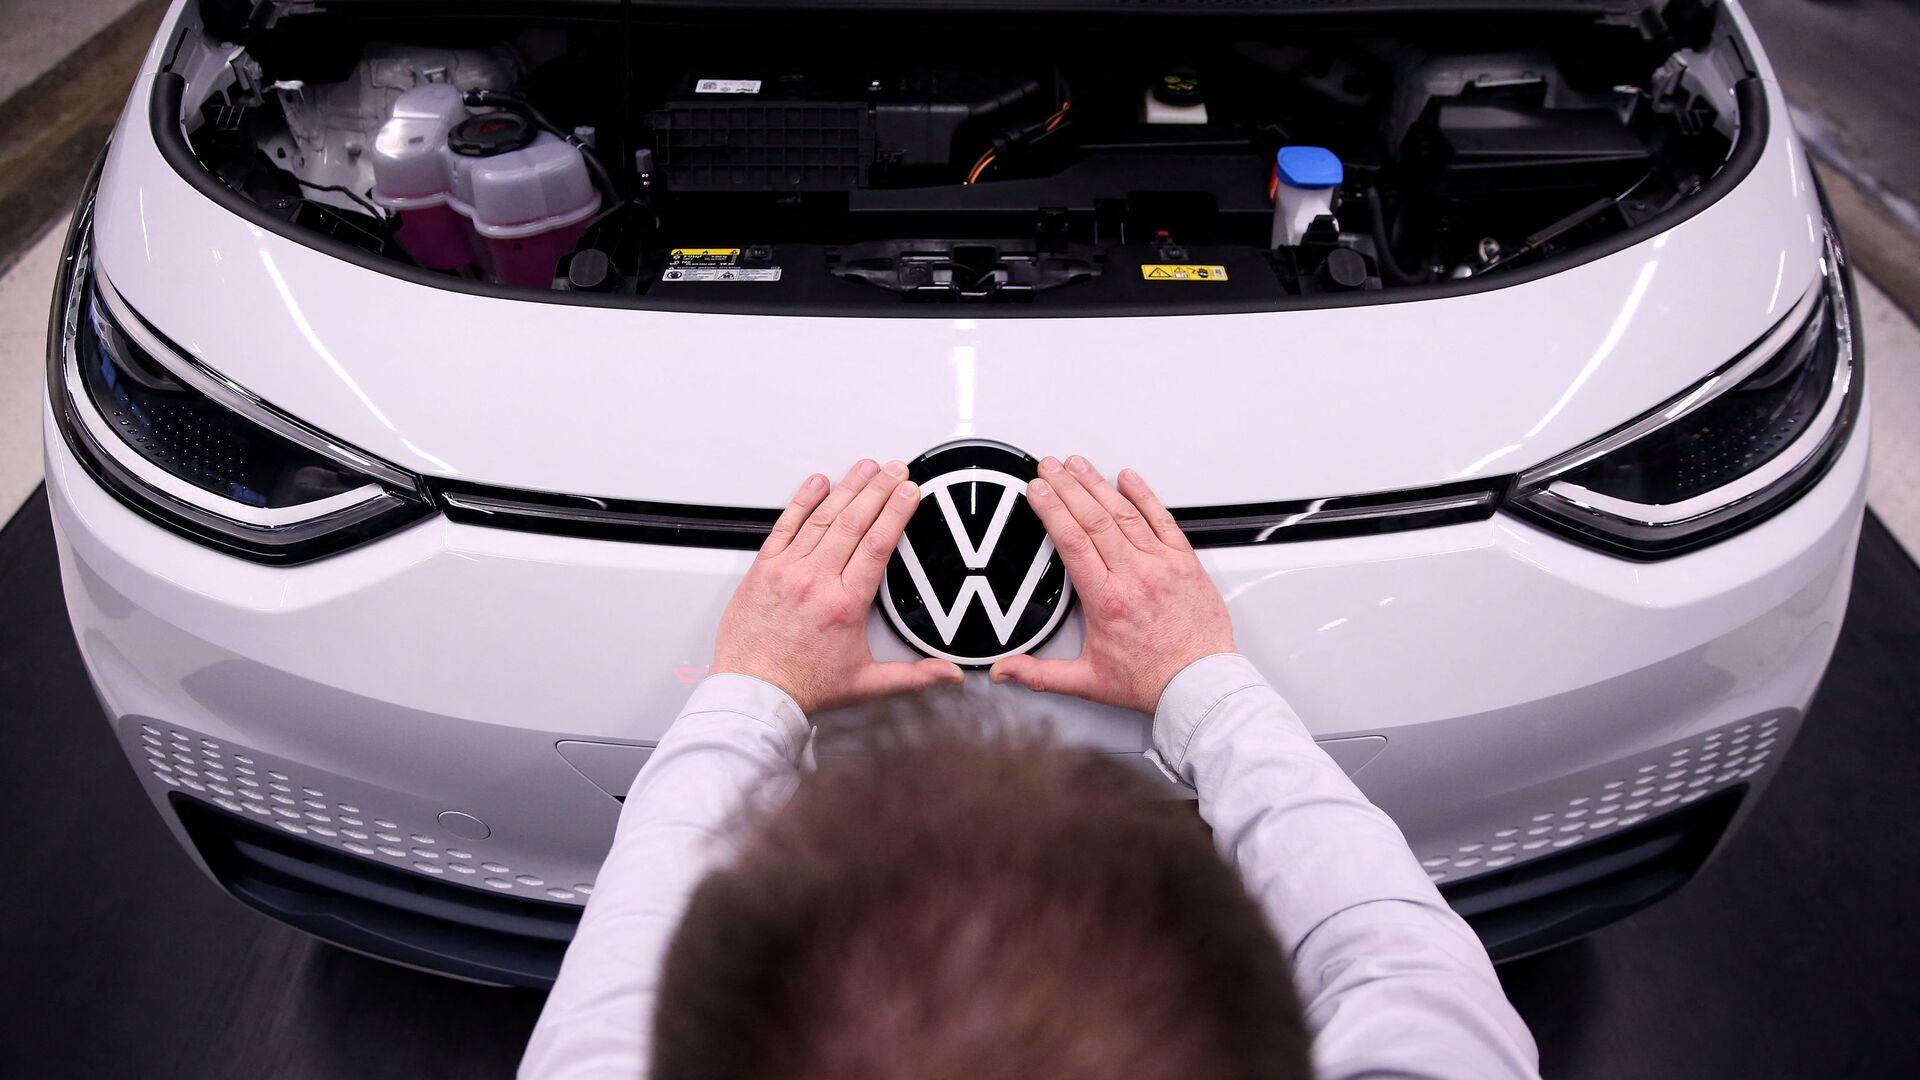 Рабочий устанавливает логотип VW на электромобиле Volkswagen ID.3 на сборочном конвейере автозавода Volkswagen - Sputnik Italia, 1920, 03.09.2021